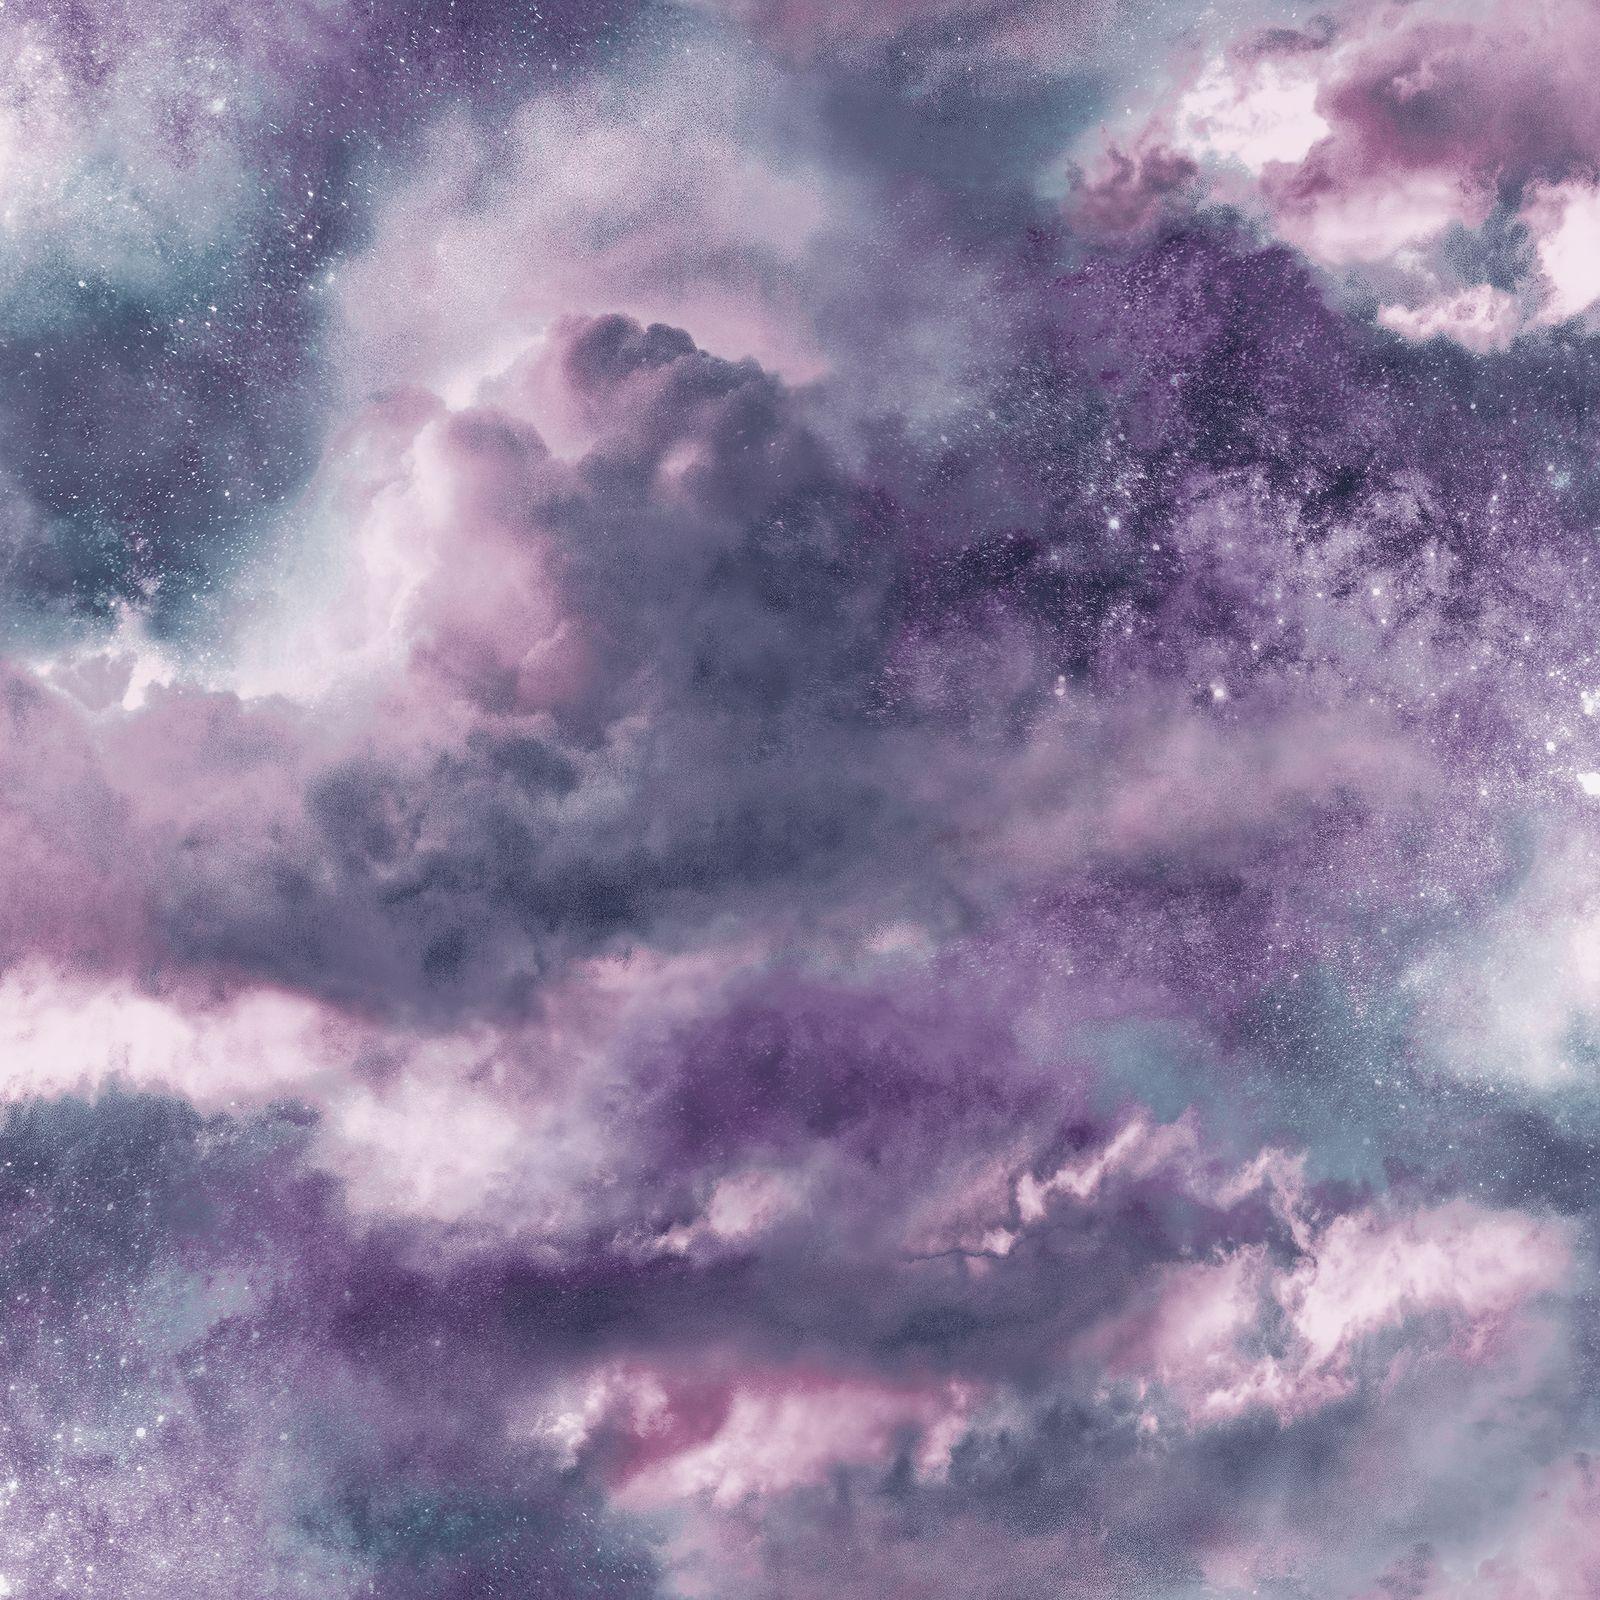 13 Bedroom Wallpaper Ideas To Transform Plain Walls Blush Wallpaper Cloud Wallpaper Purple Wallpaper